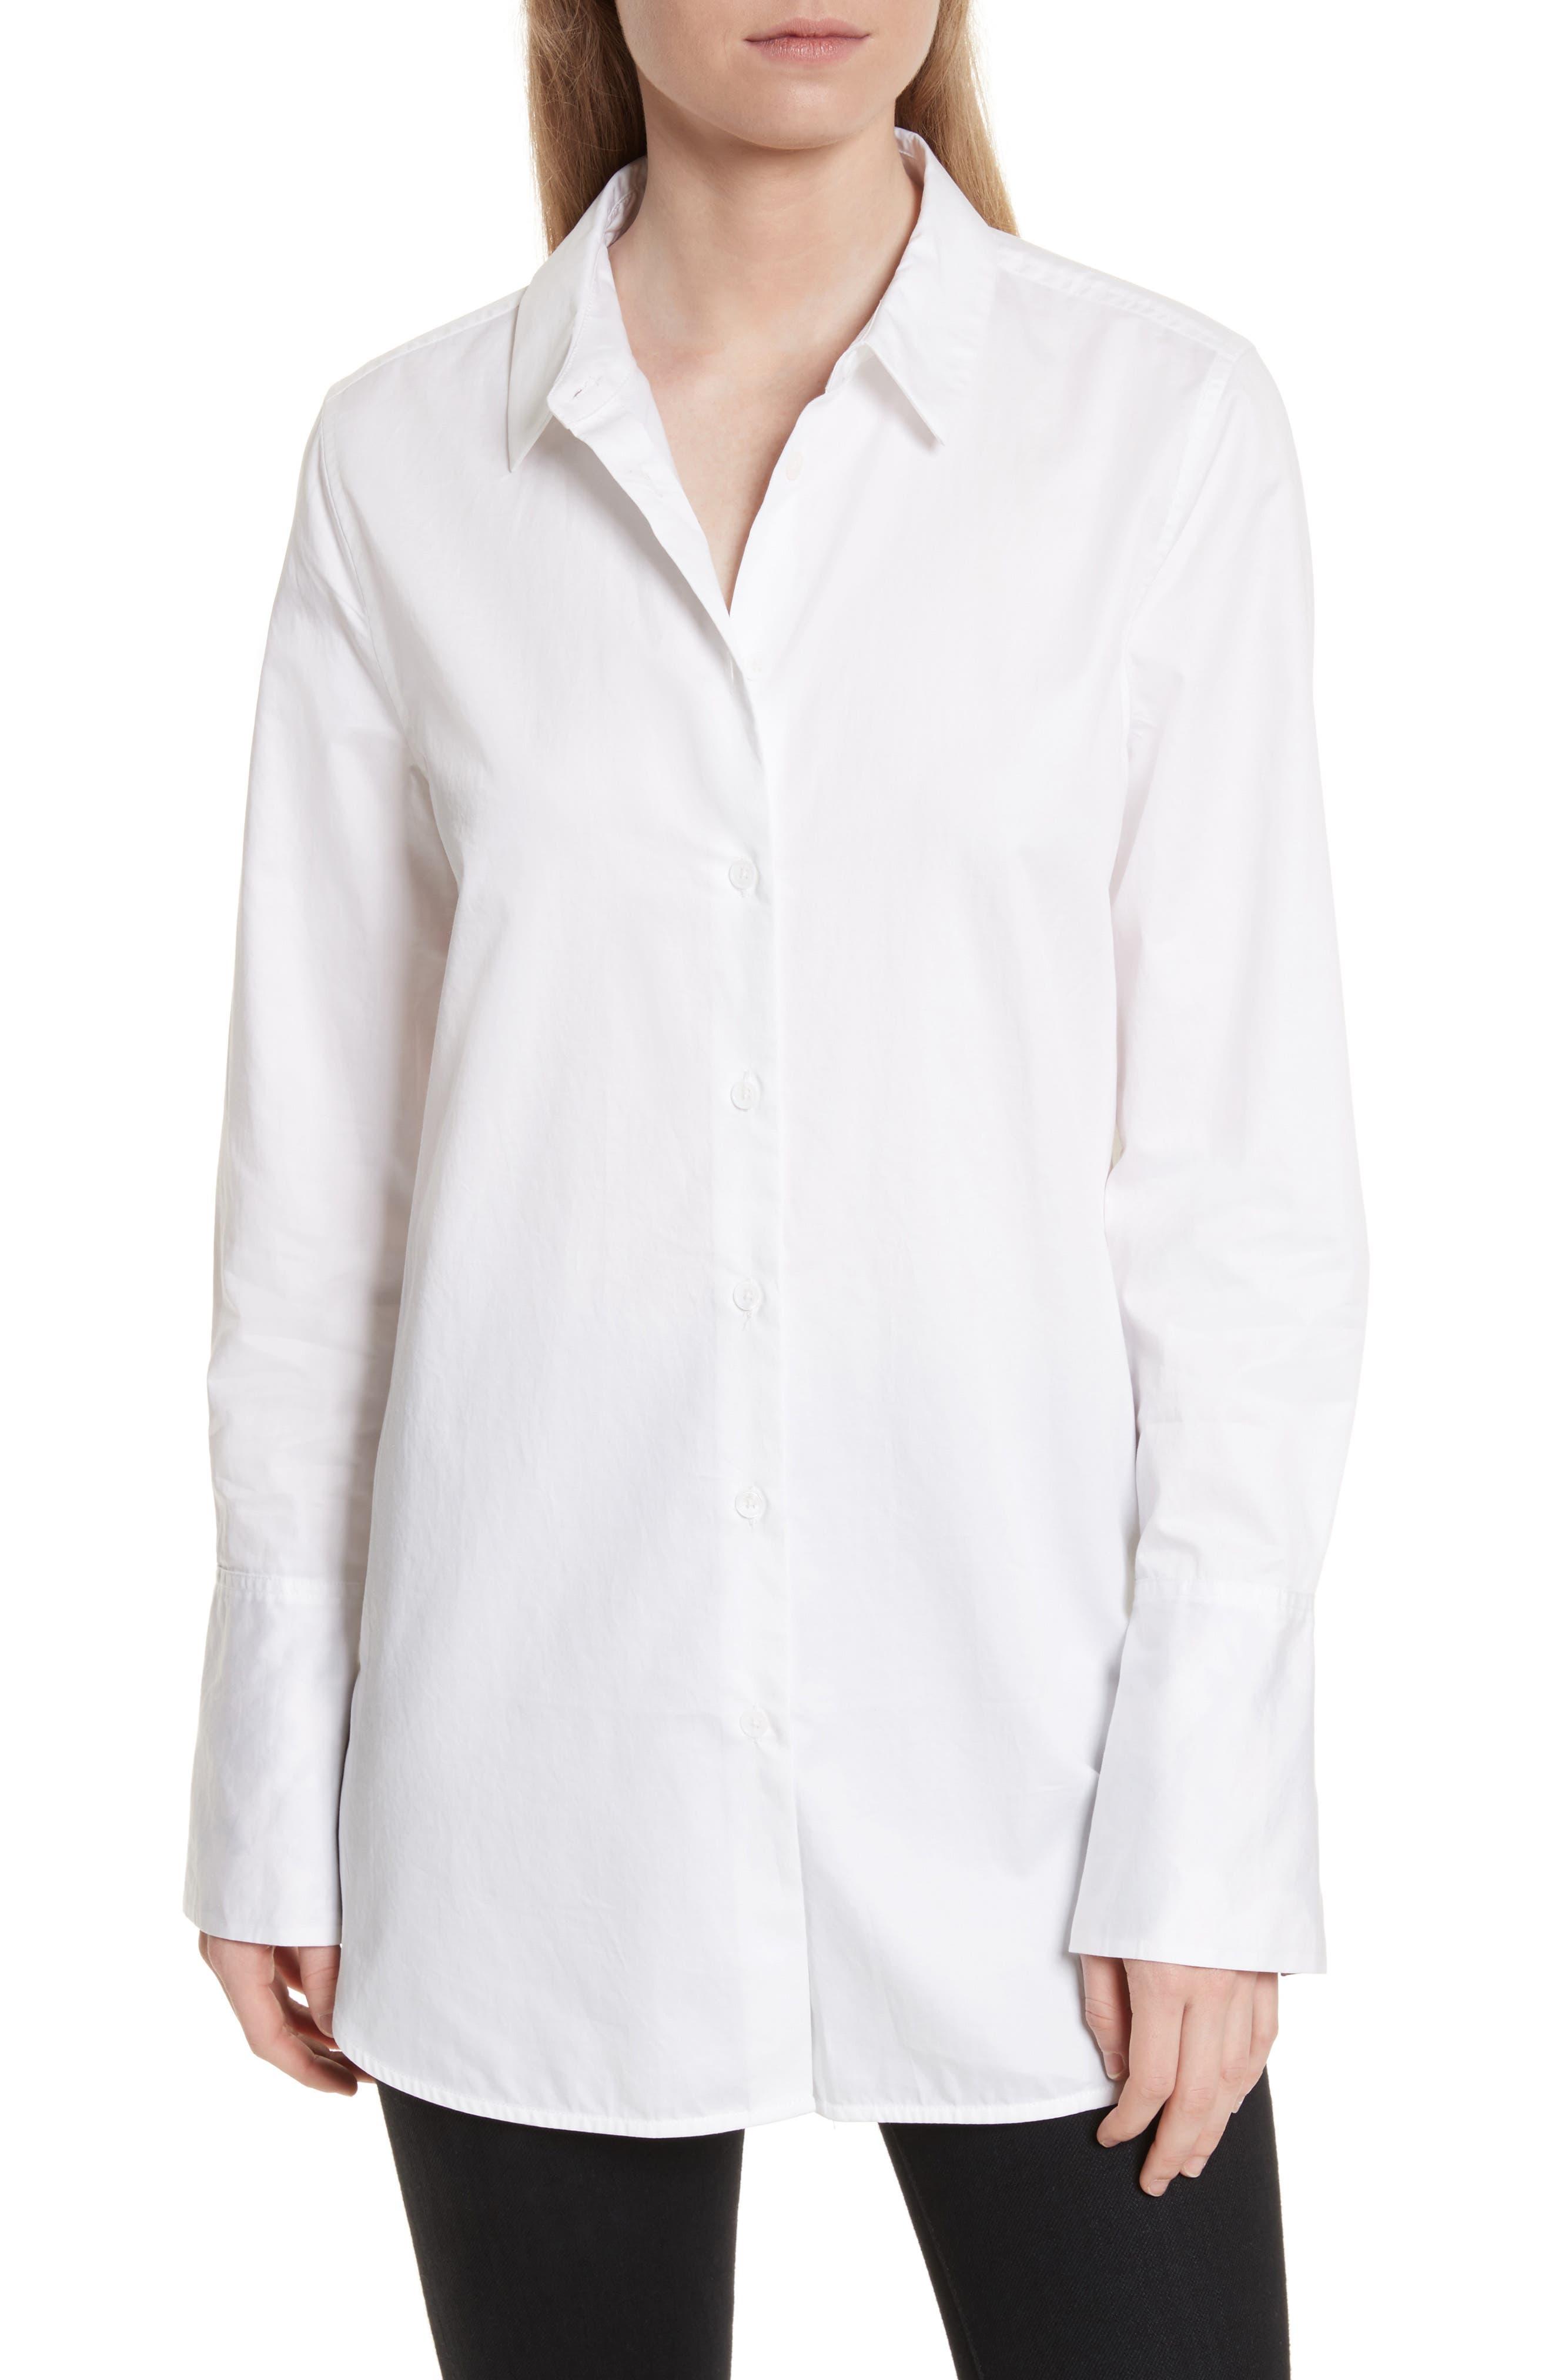 Arlette Cotton Shirt,                         Main,                         color, Bright White